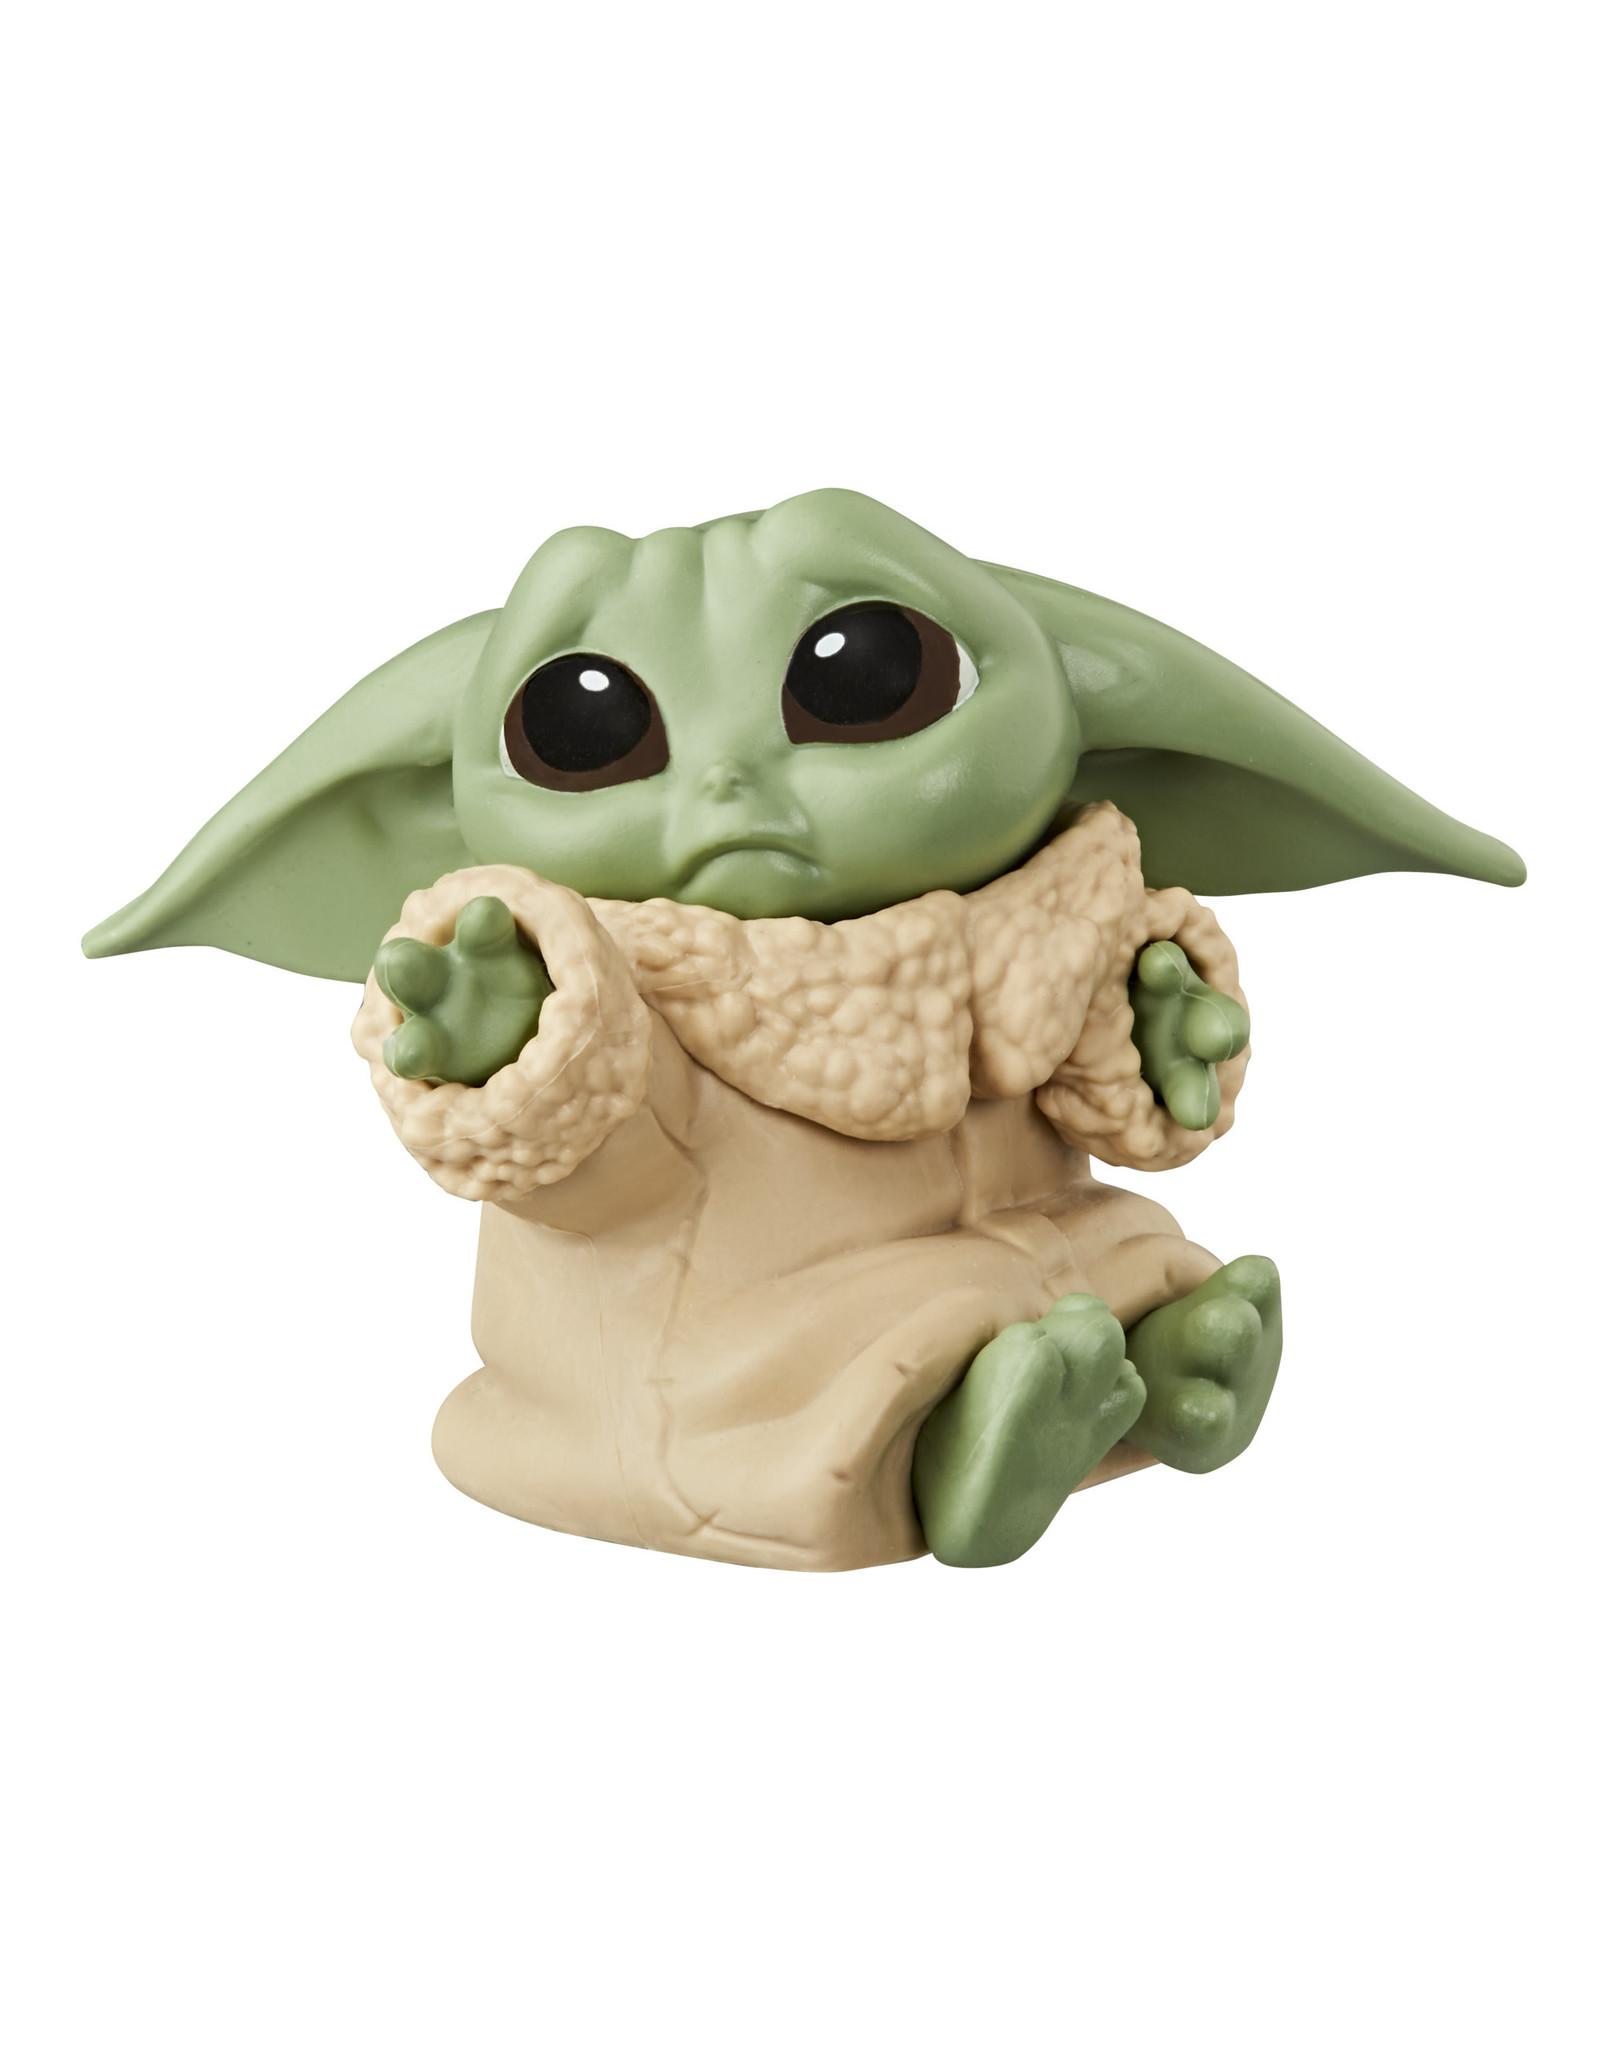 Hasbro Star Wars - Mandalorian the Child Bounty - Hold Me